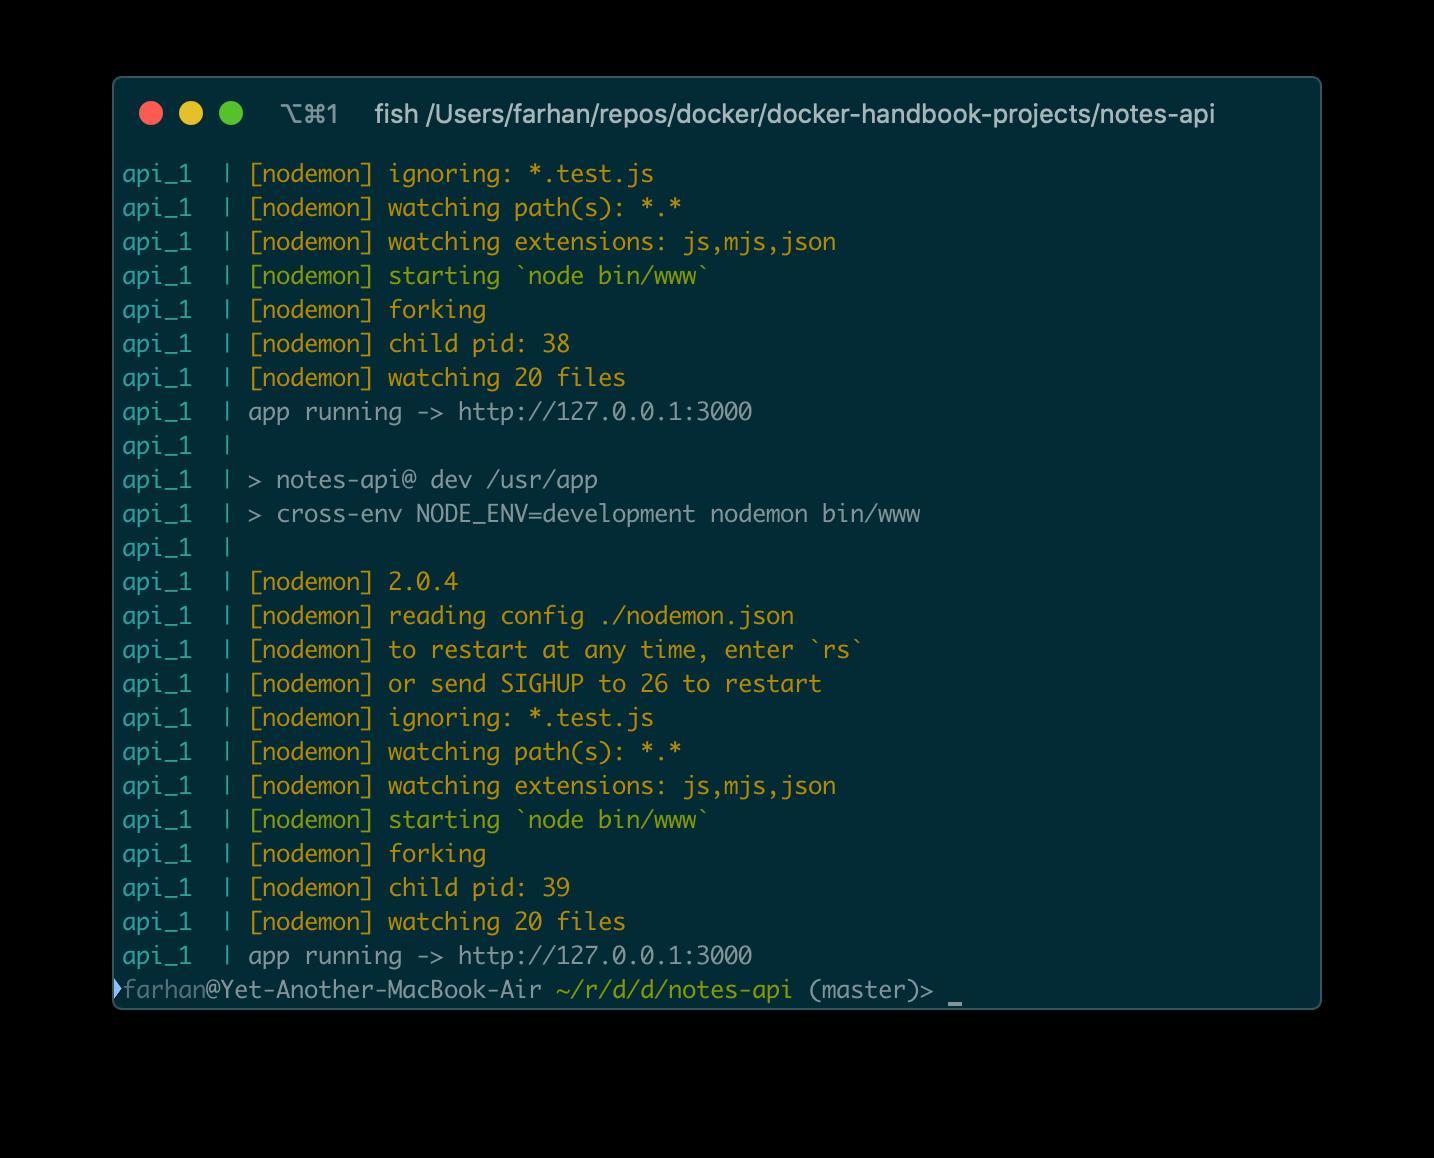 docker-compose logs api コマンドからの出力